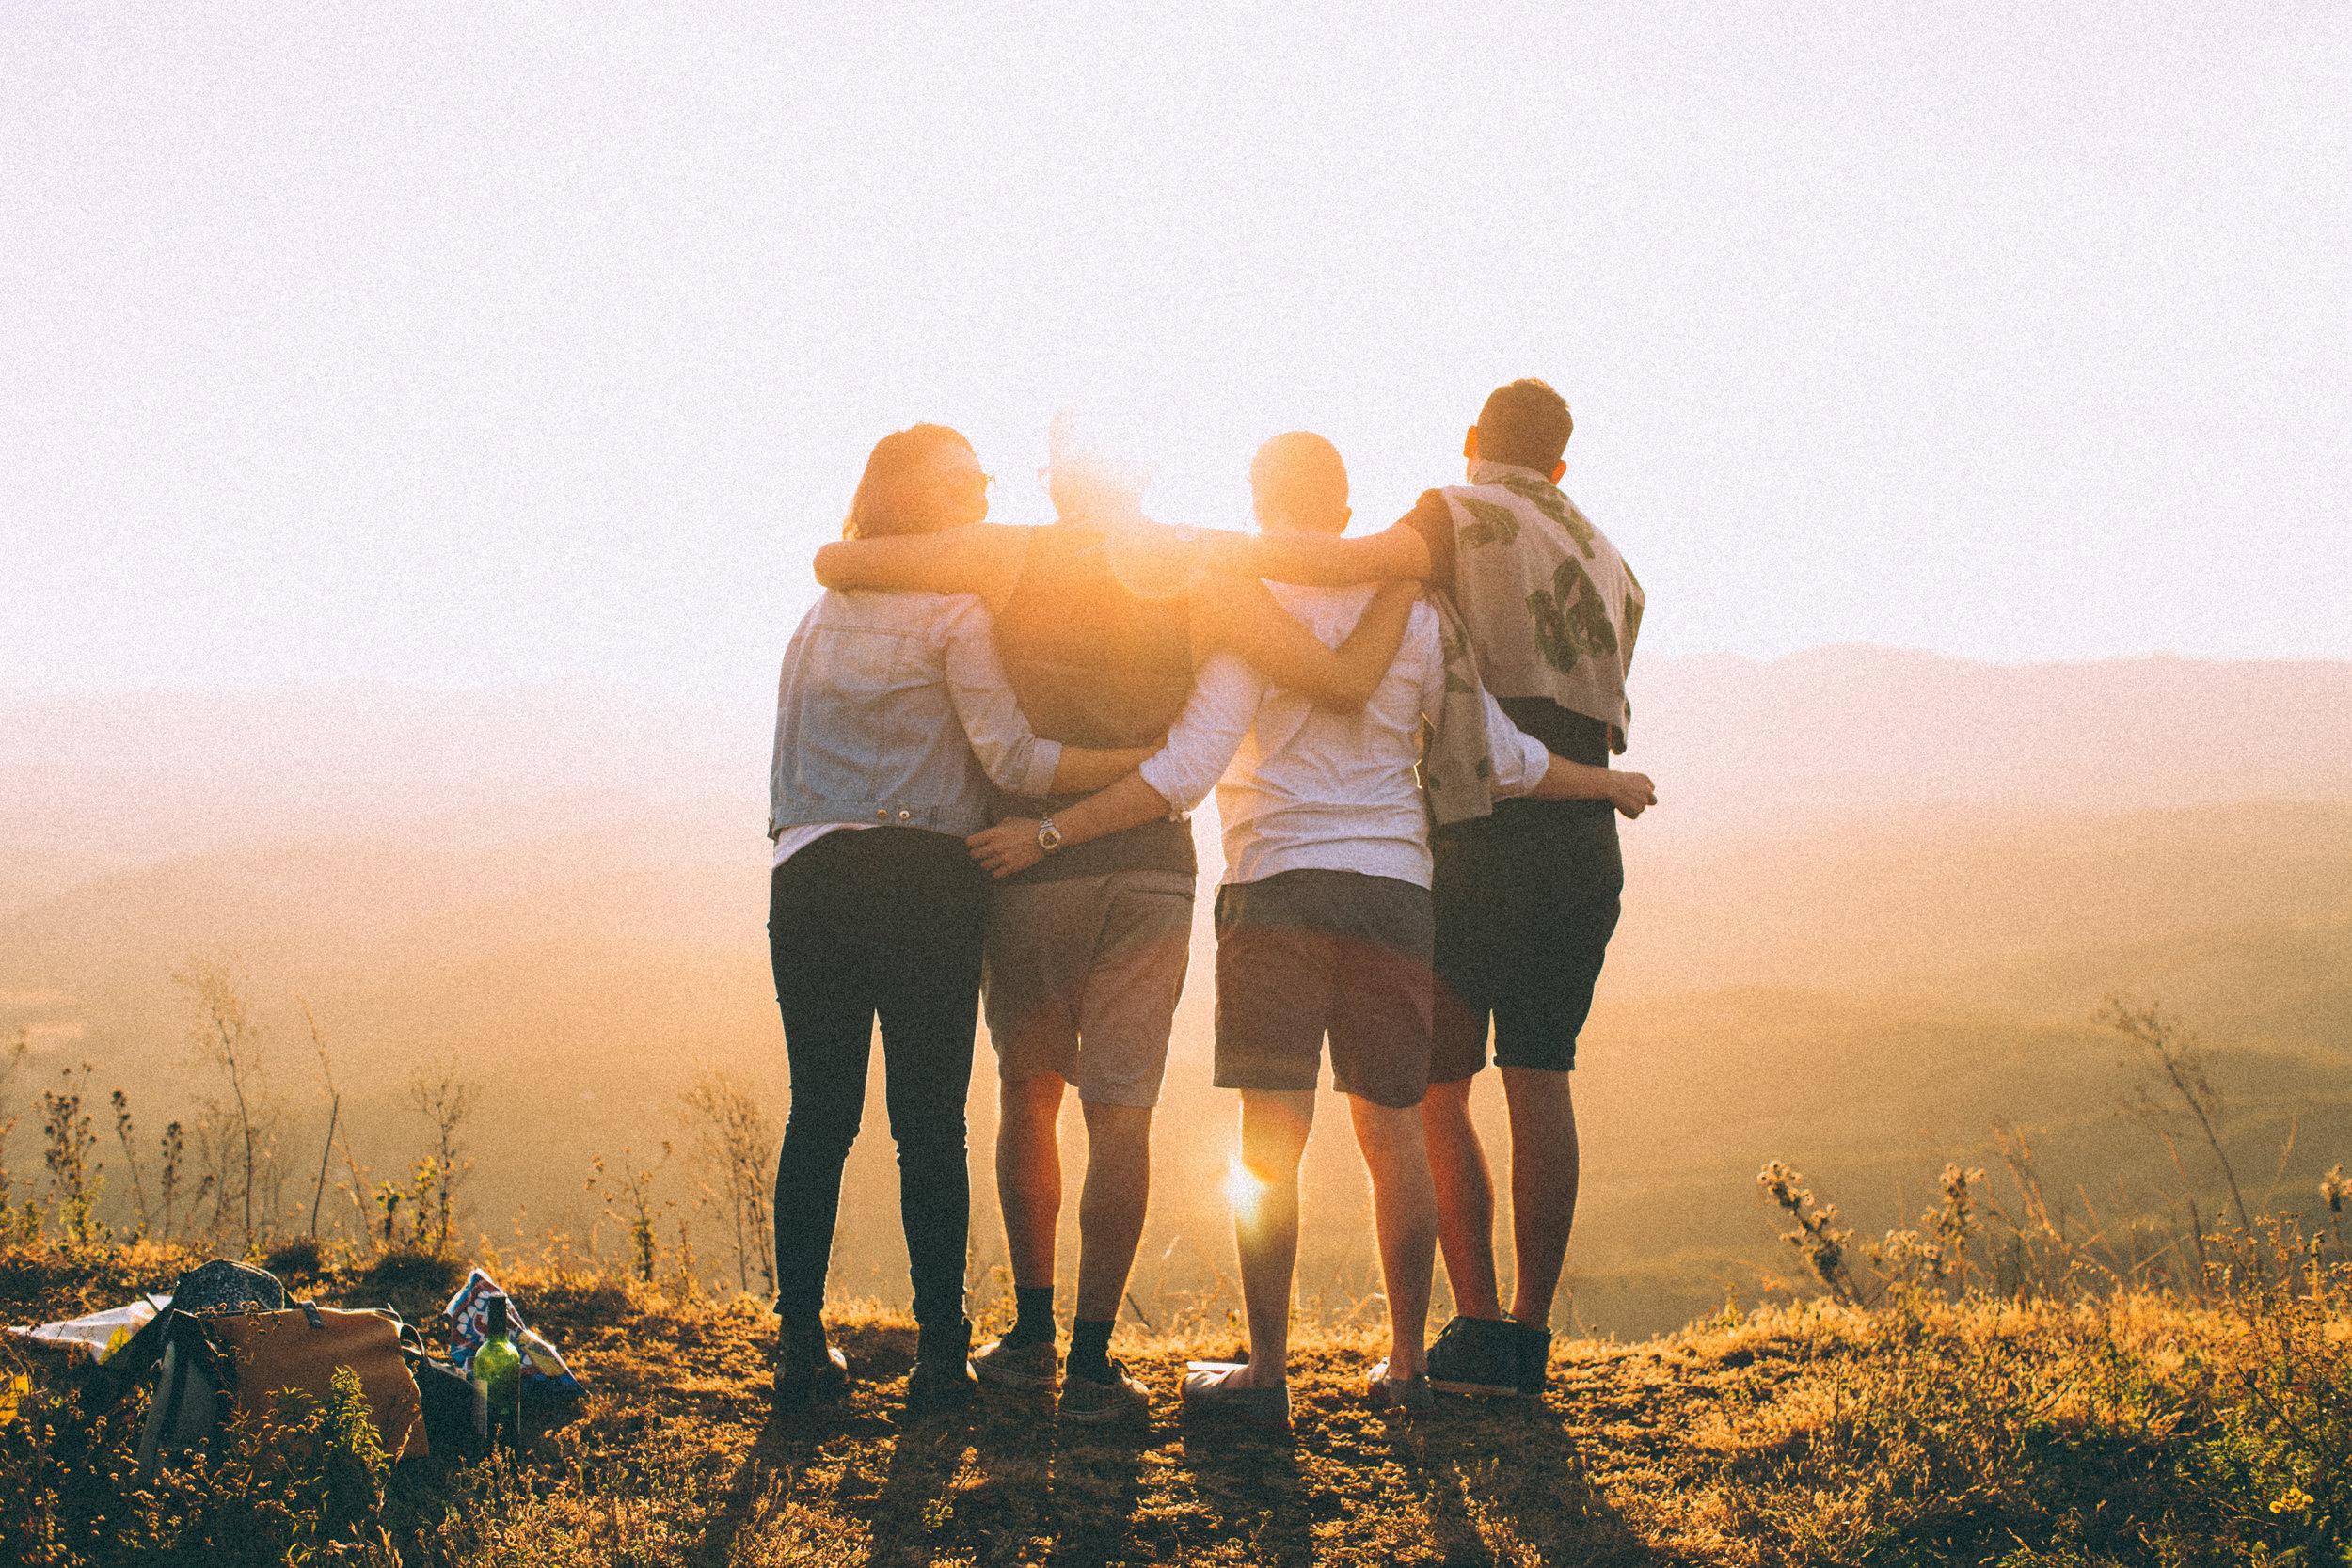 Groupwork (age 13-17)